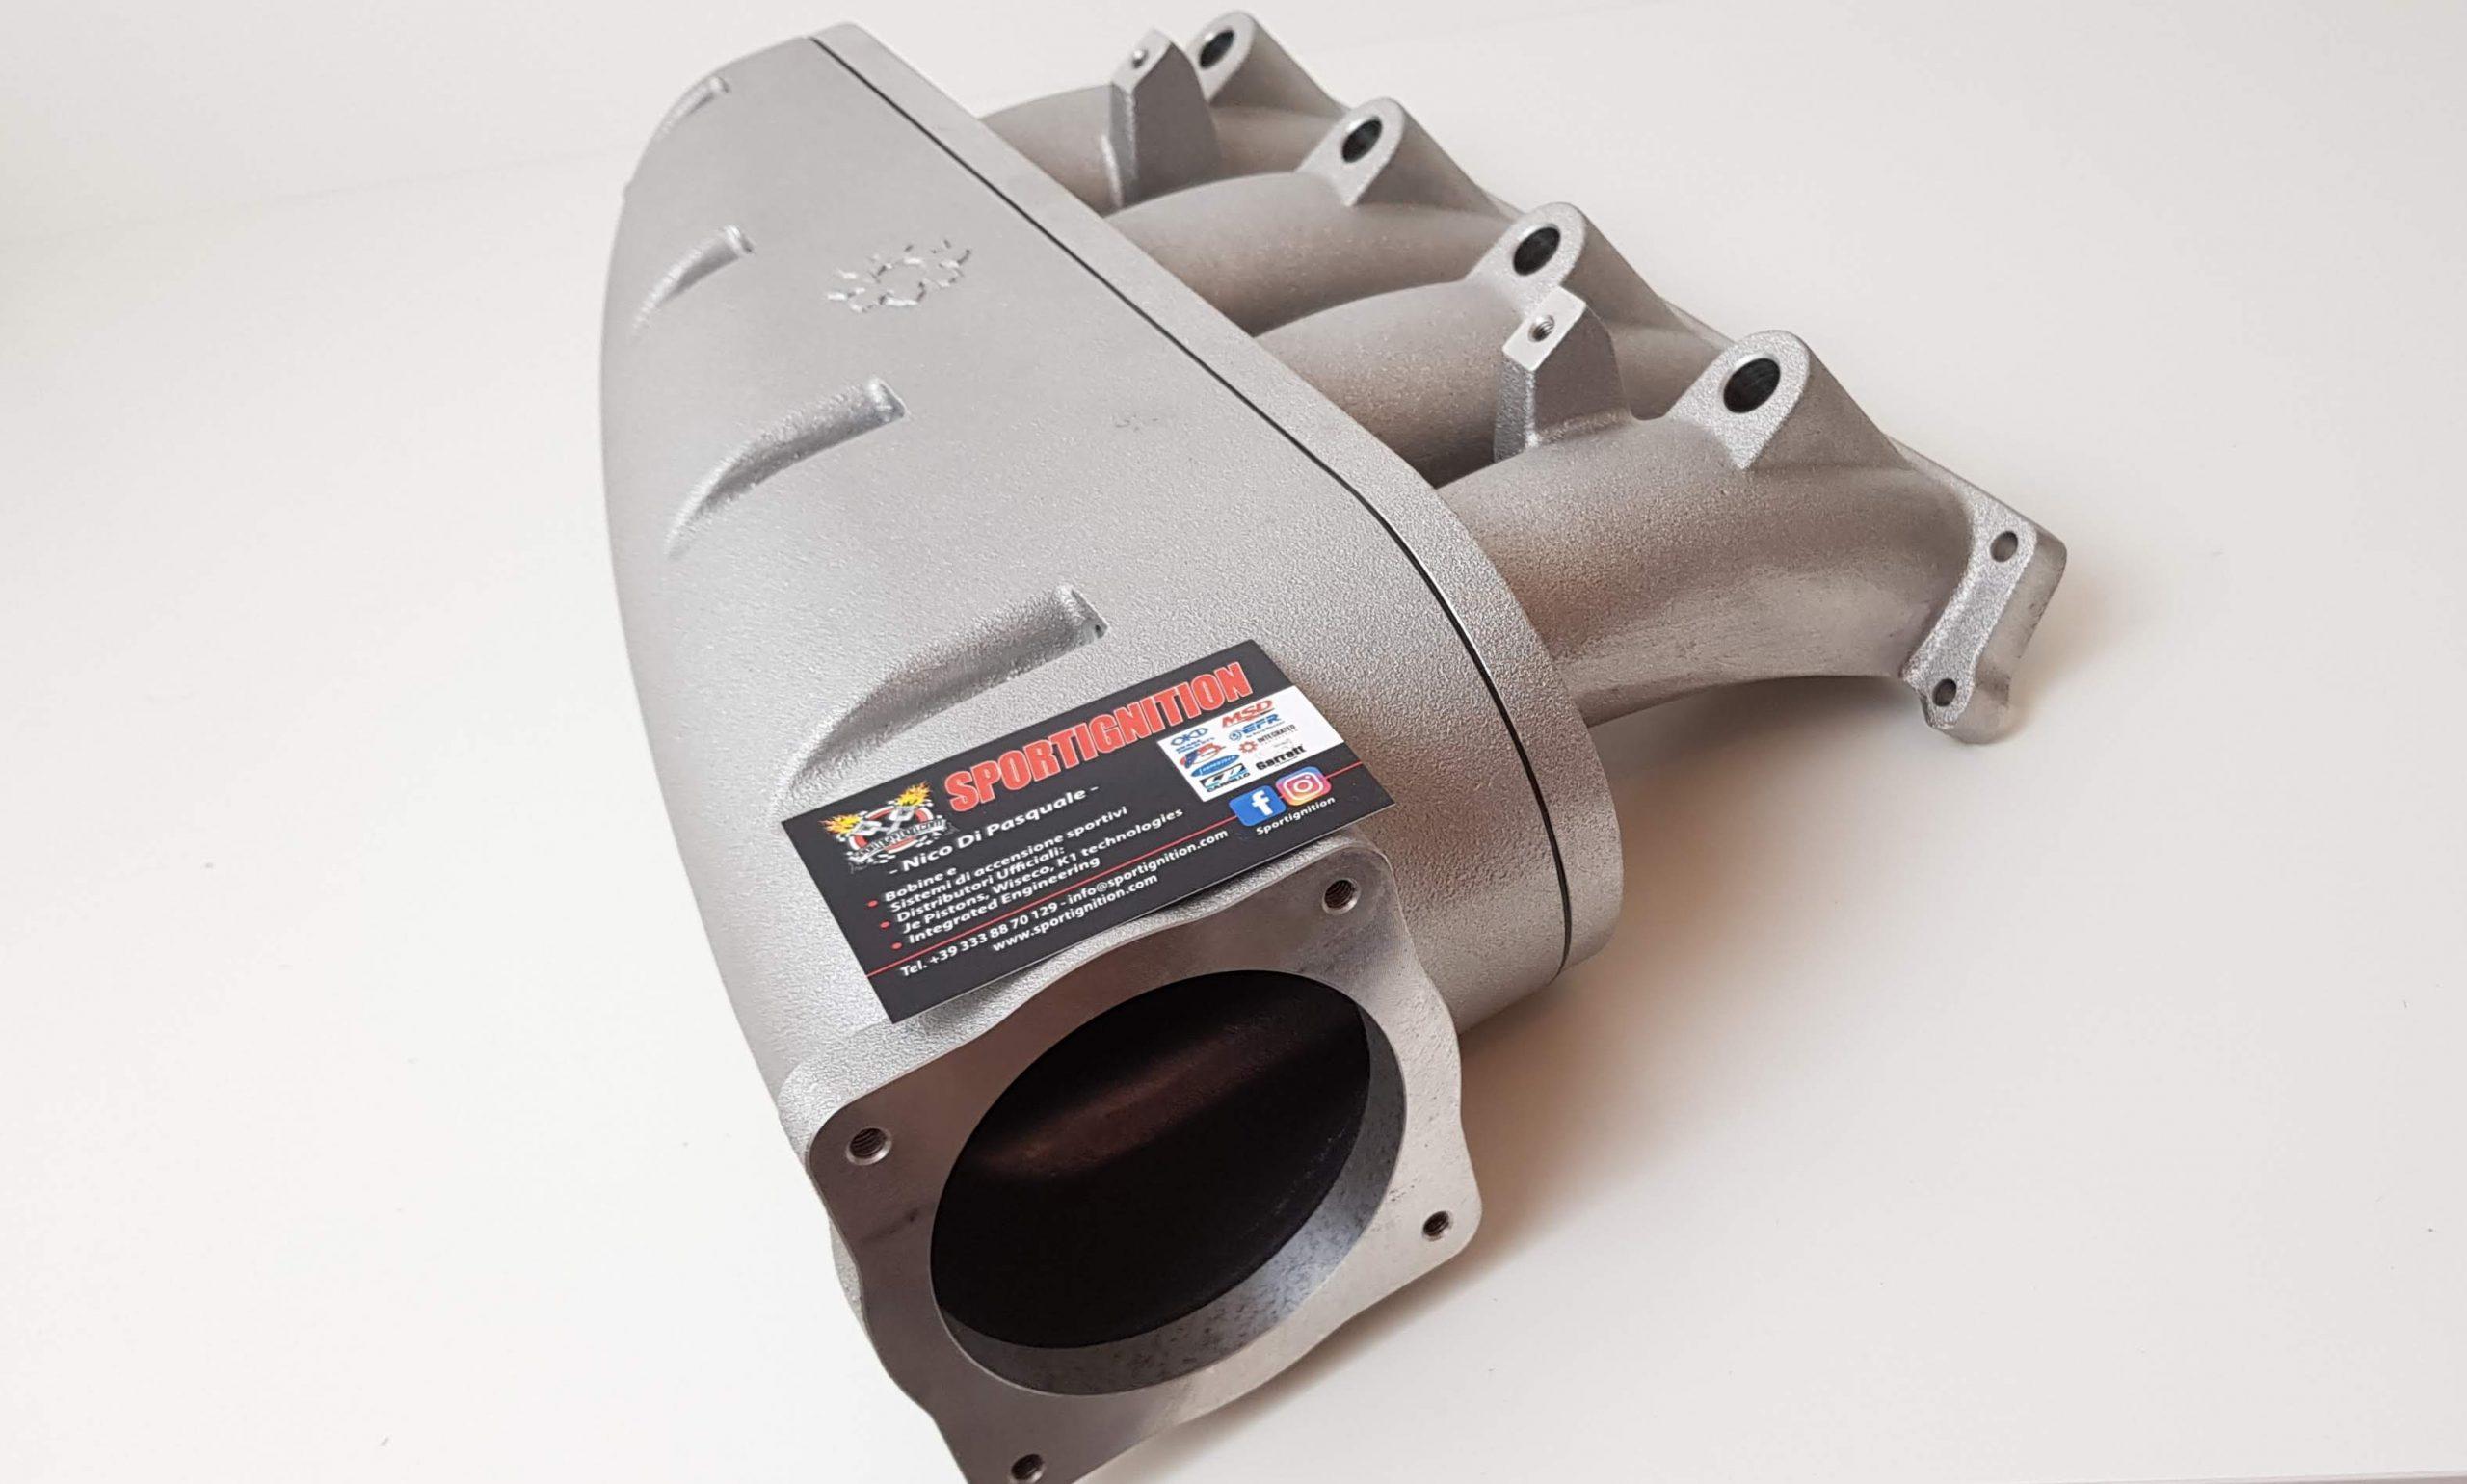 Intake manifold 1.8t 20v Vw Audi IE 80mm Body Throttle SILVER